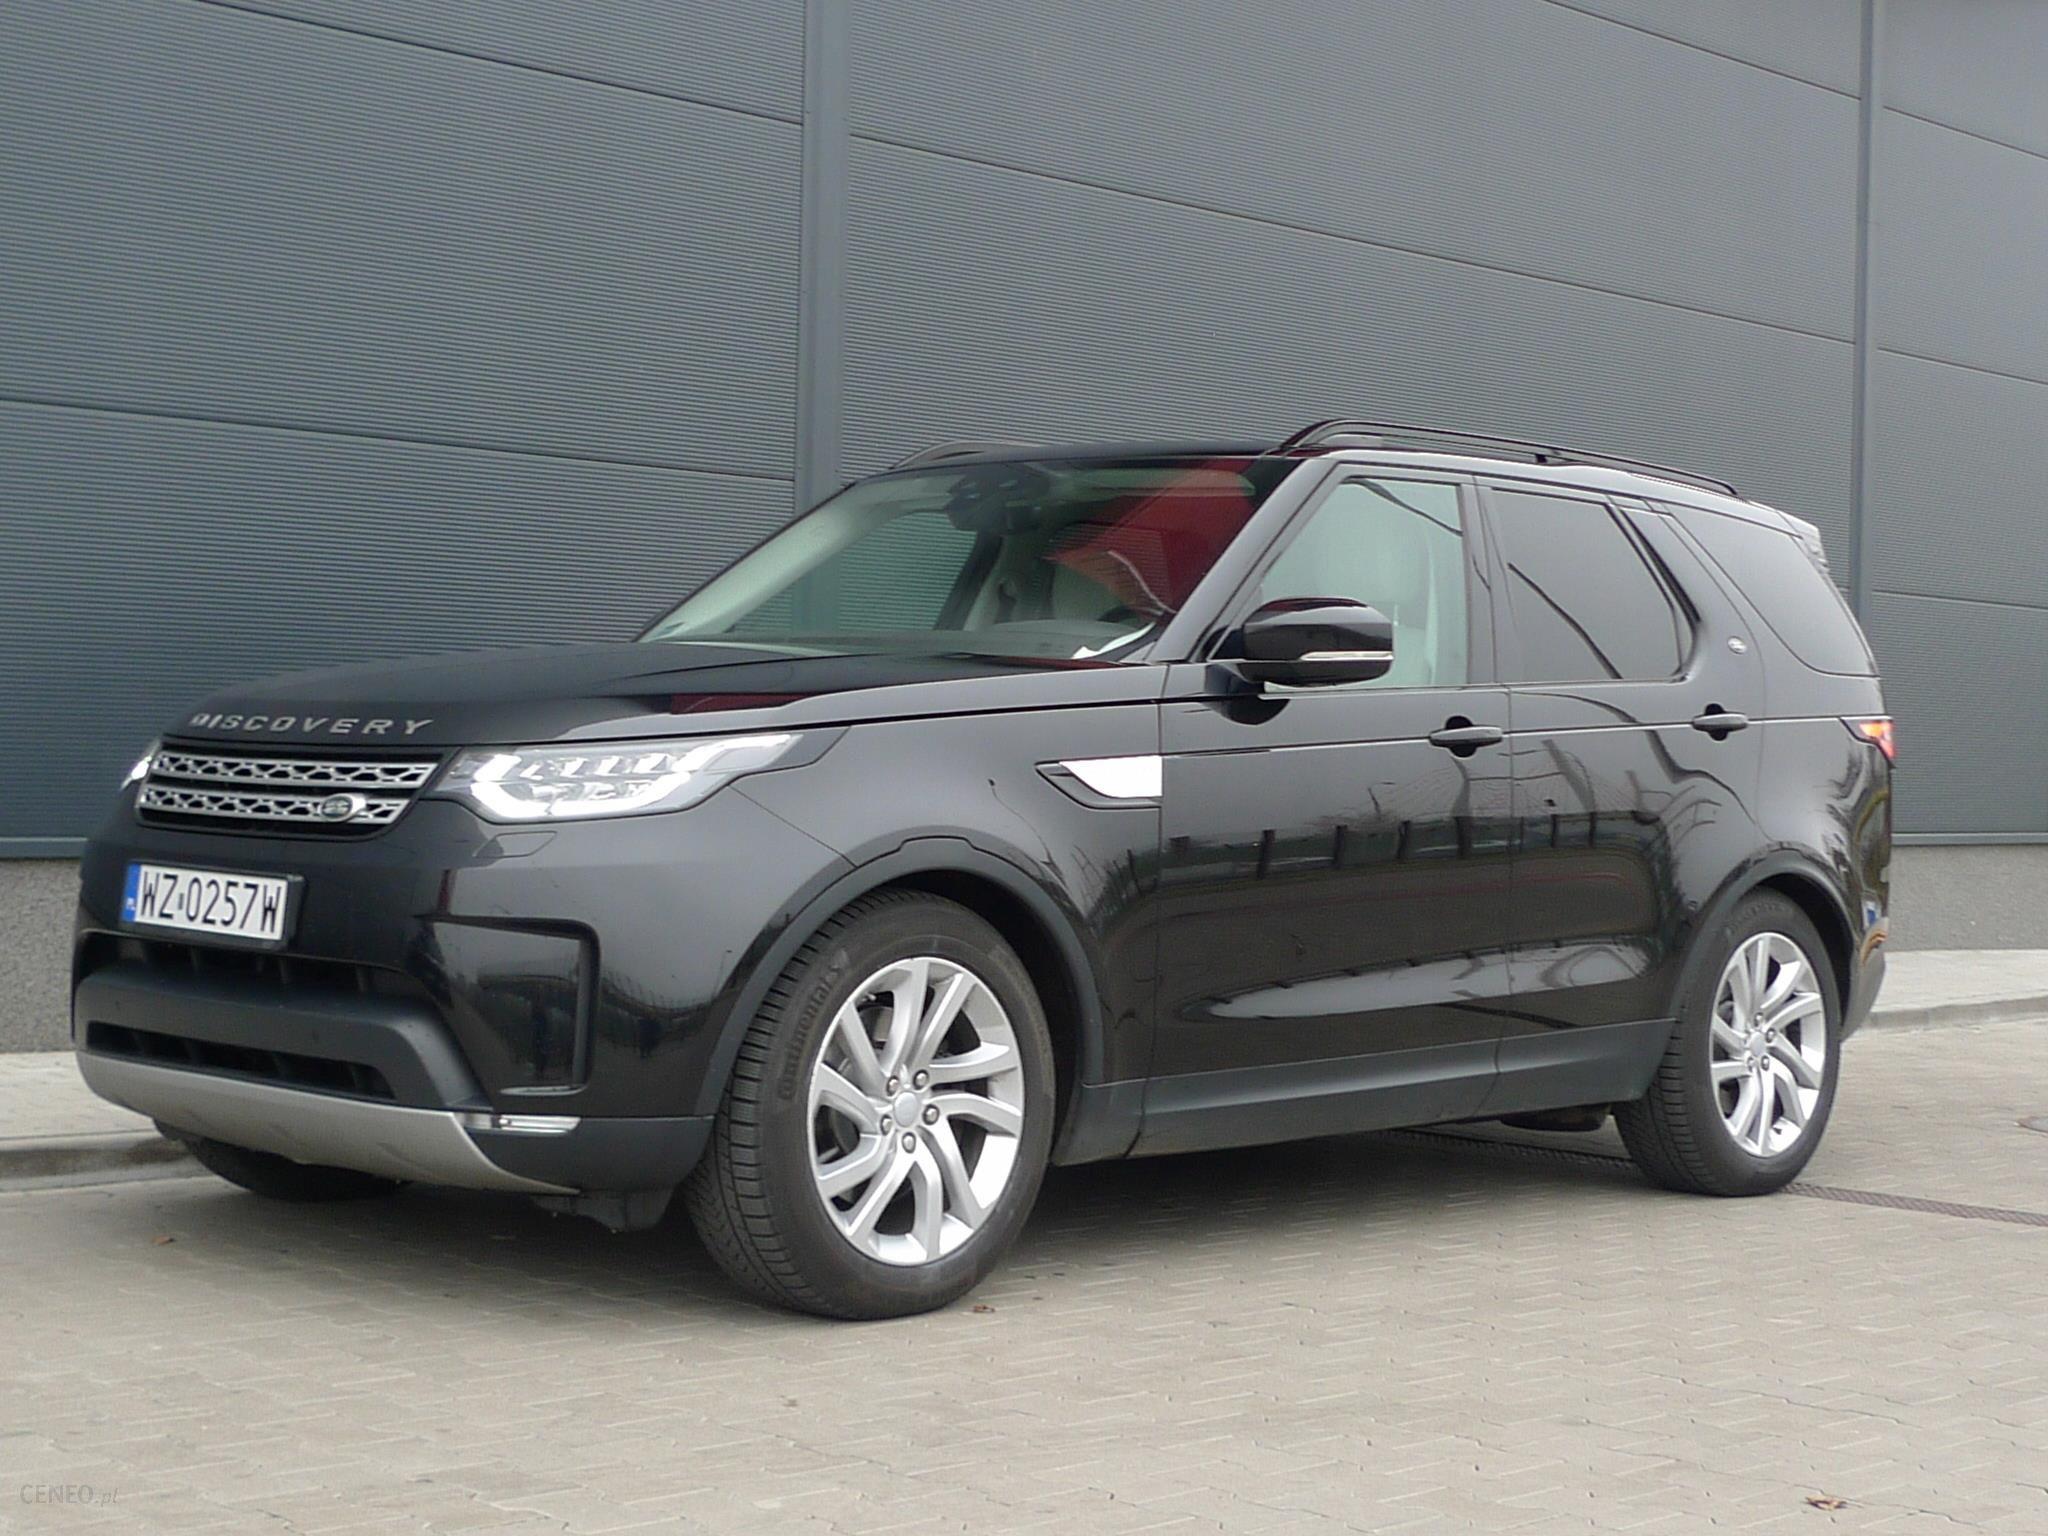 Land Rover Discovery Hse 7 Osobowy Salon Polska Opinie I Ceny Na Ceneo Pl